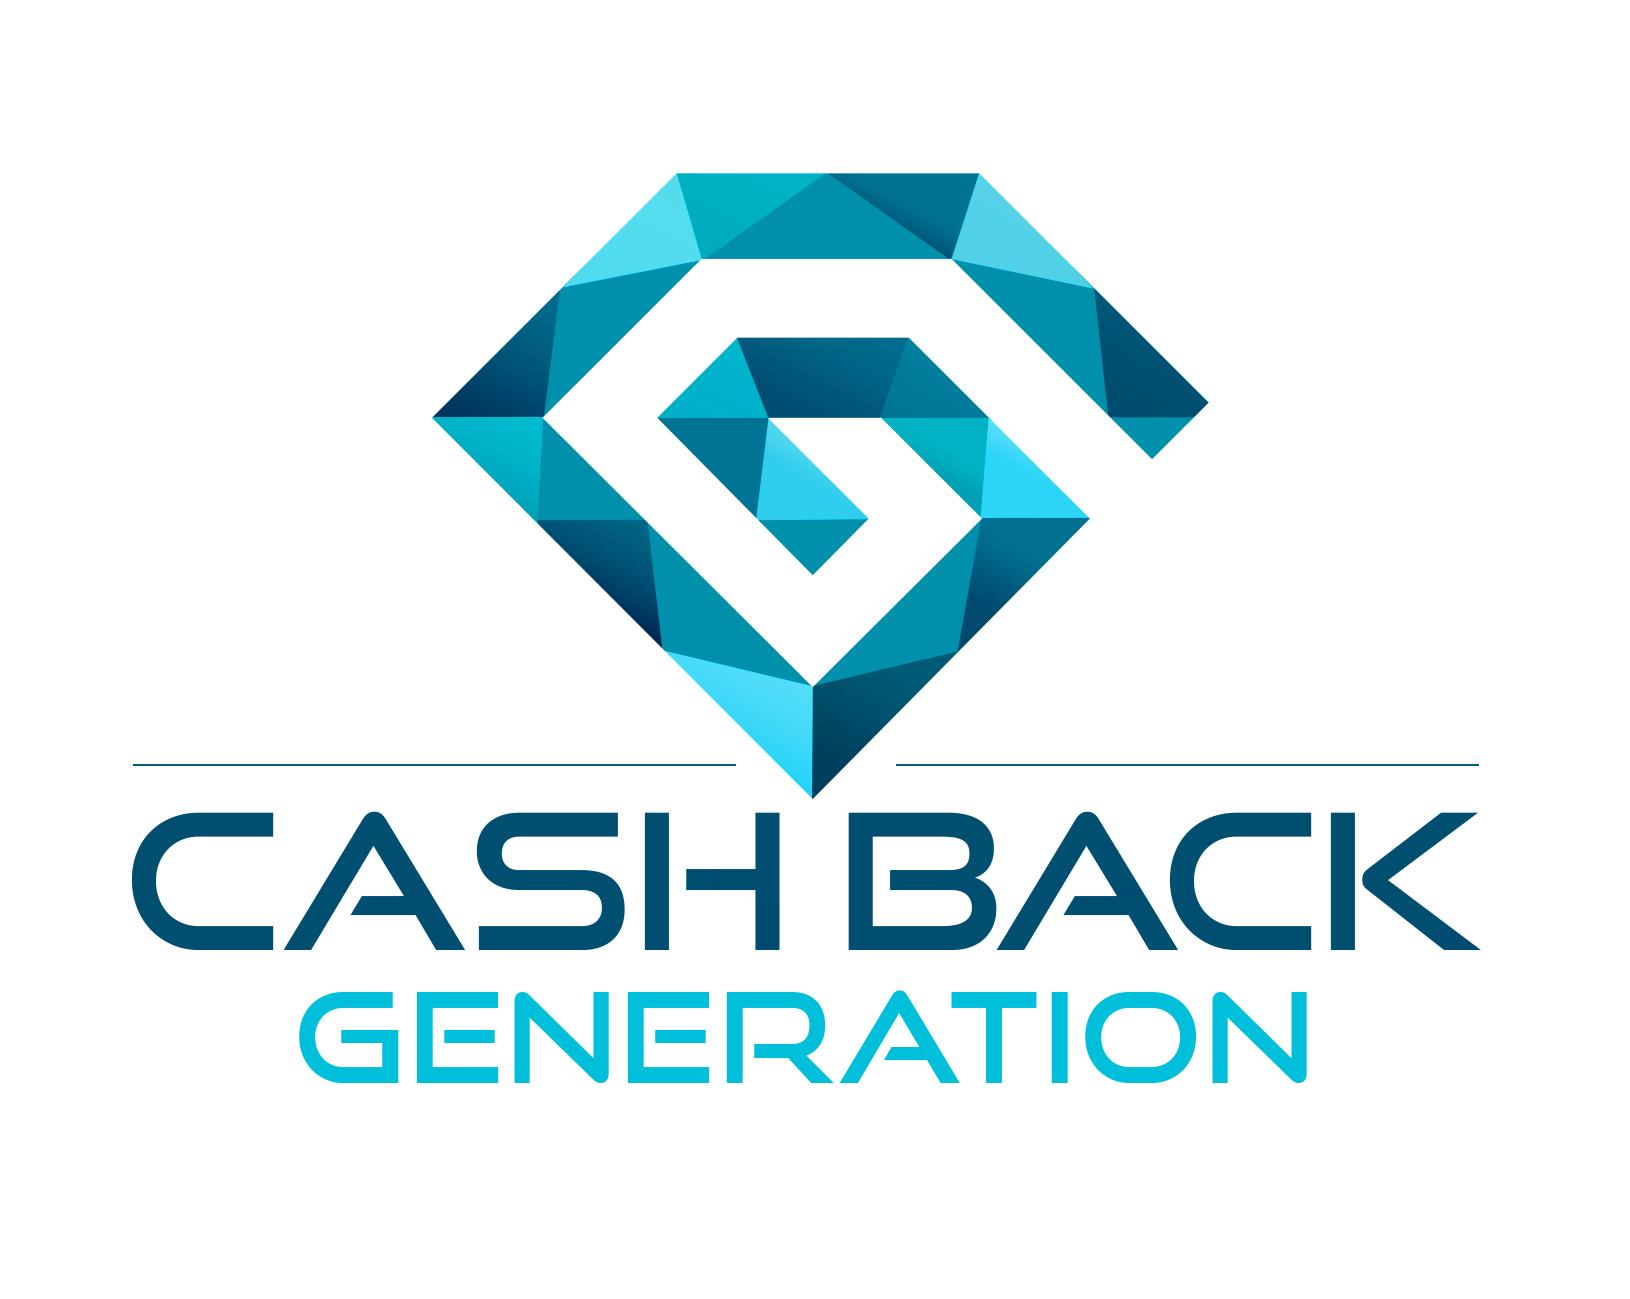 Cashbackgeneration